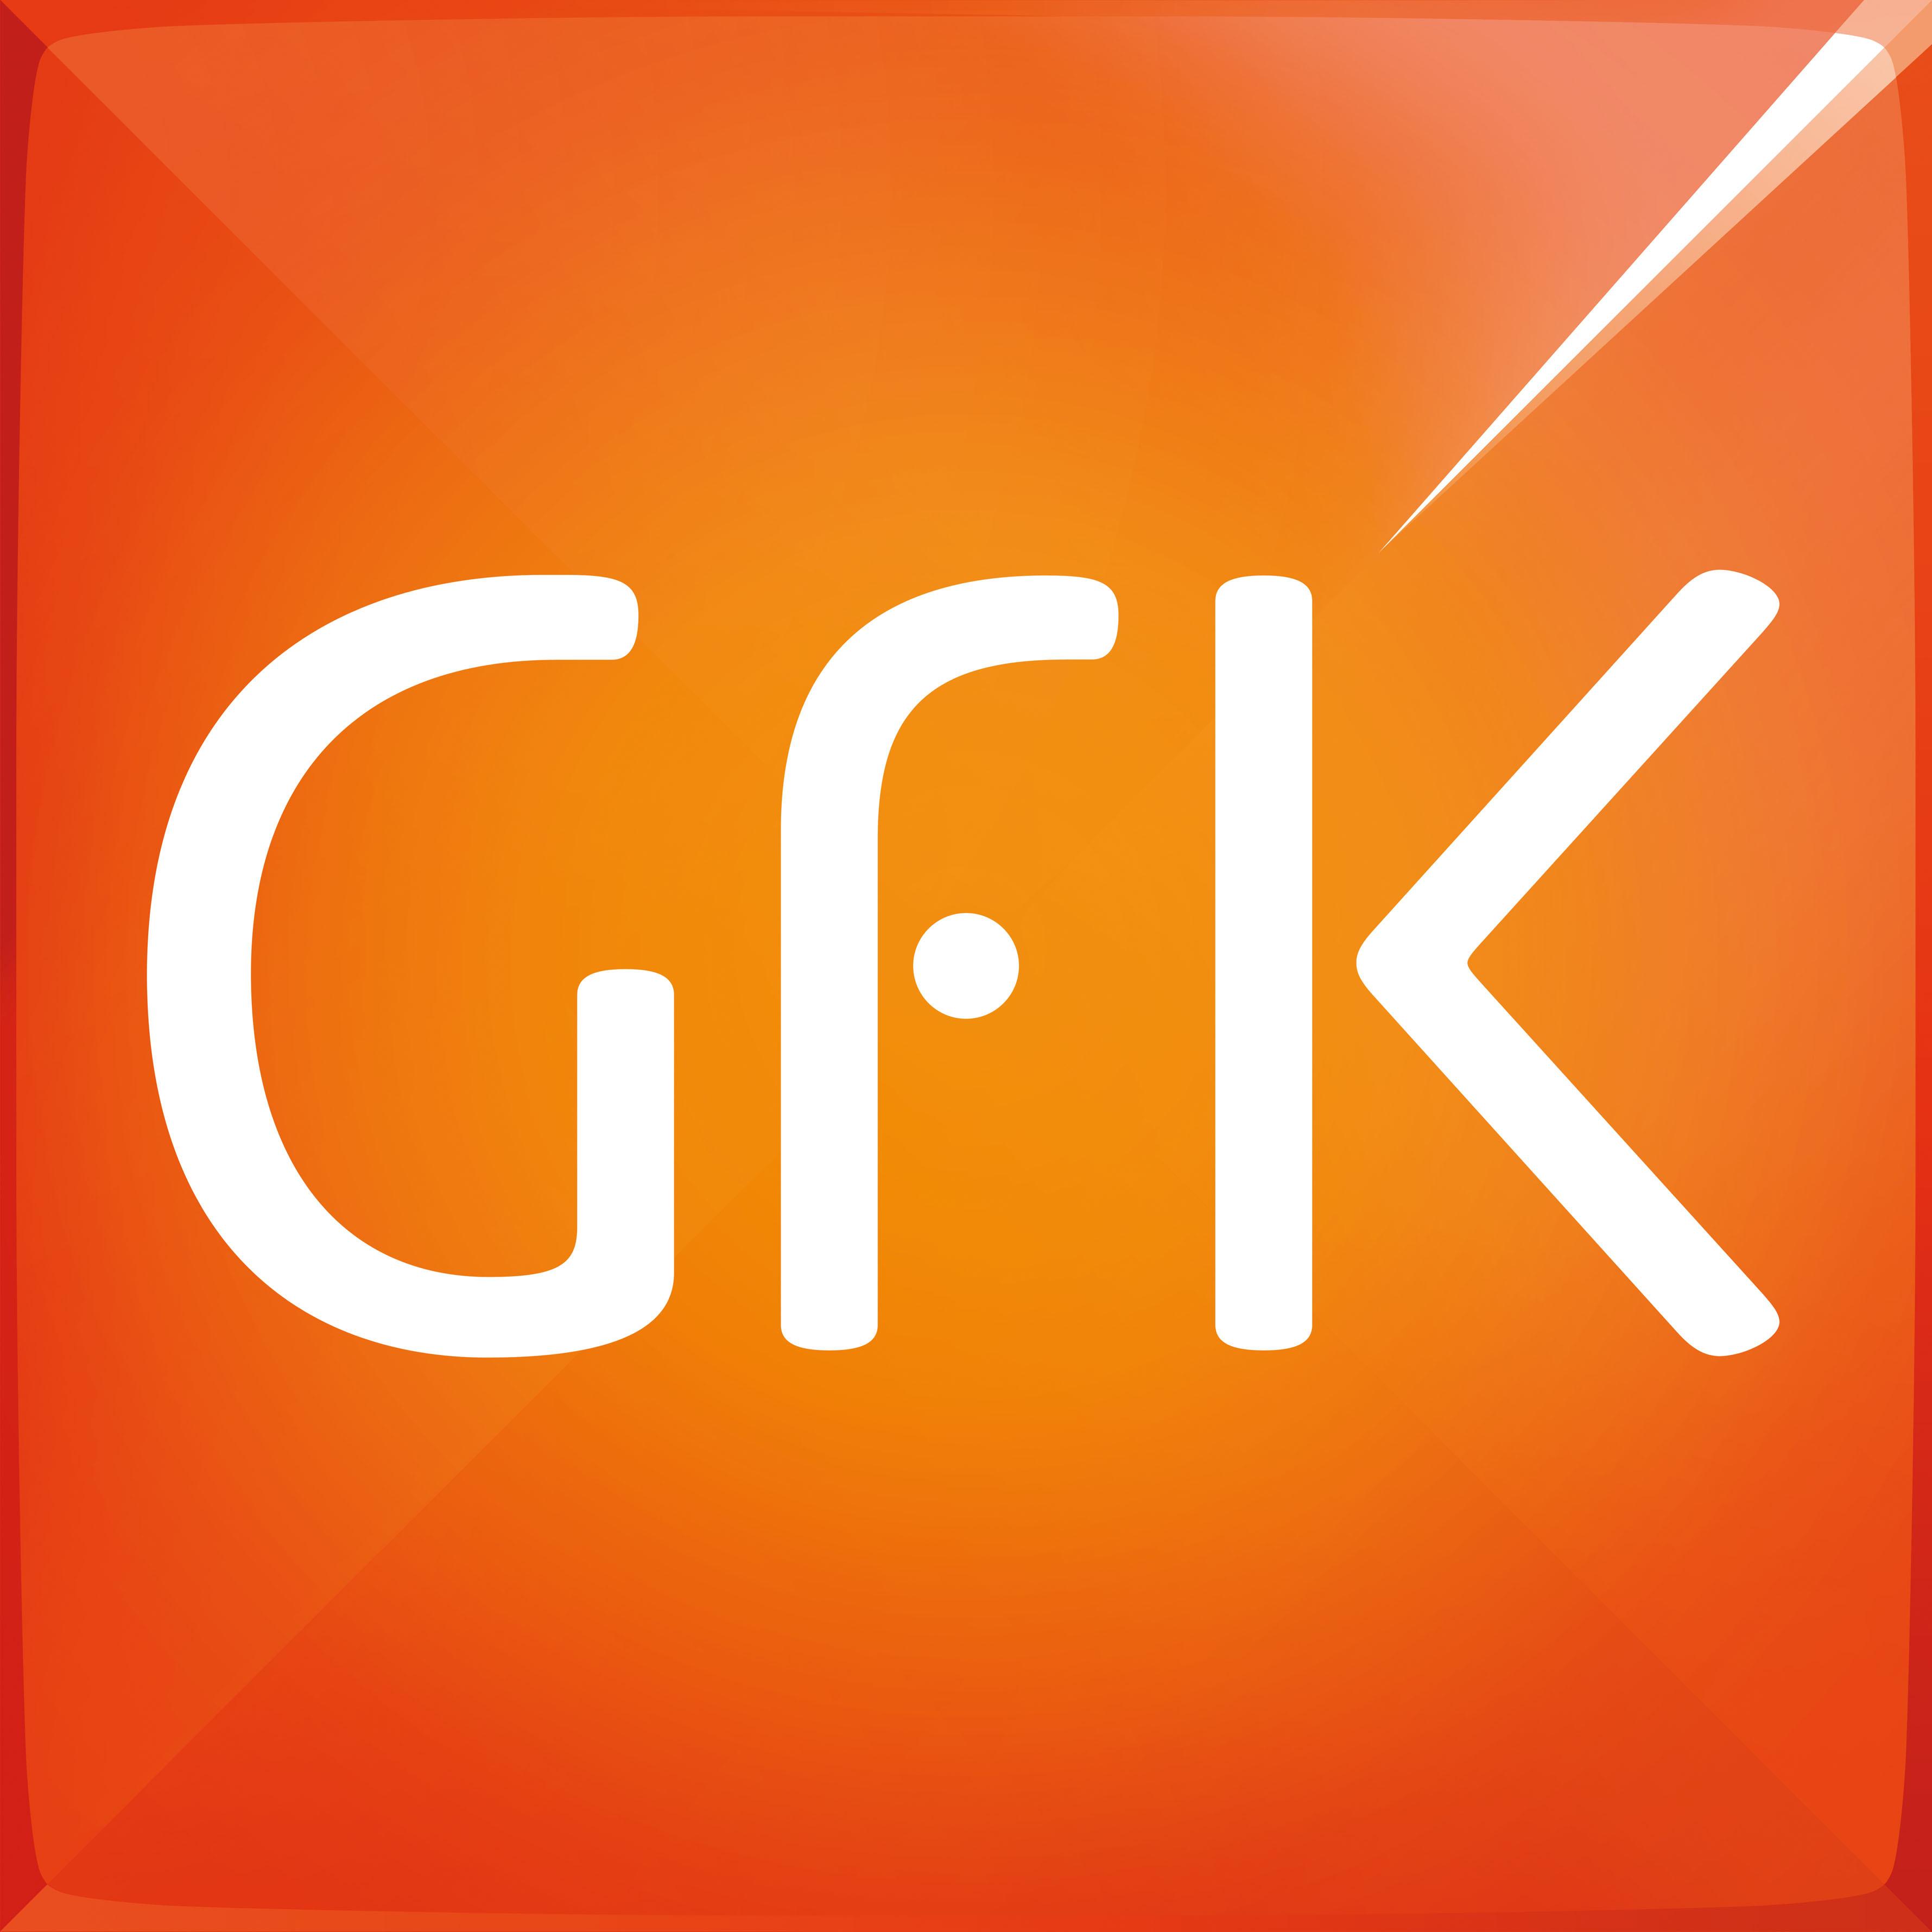 Gfk News